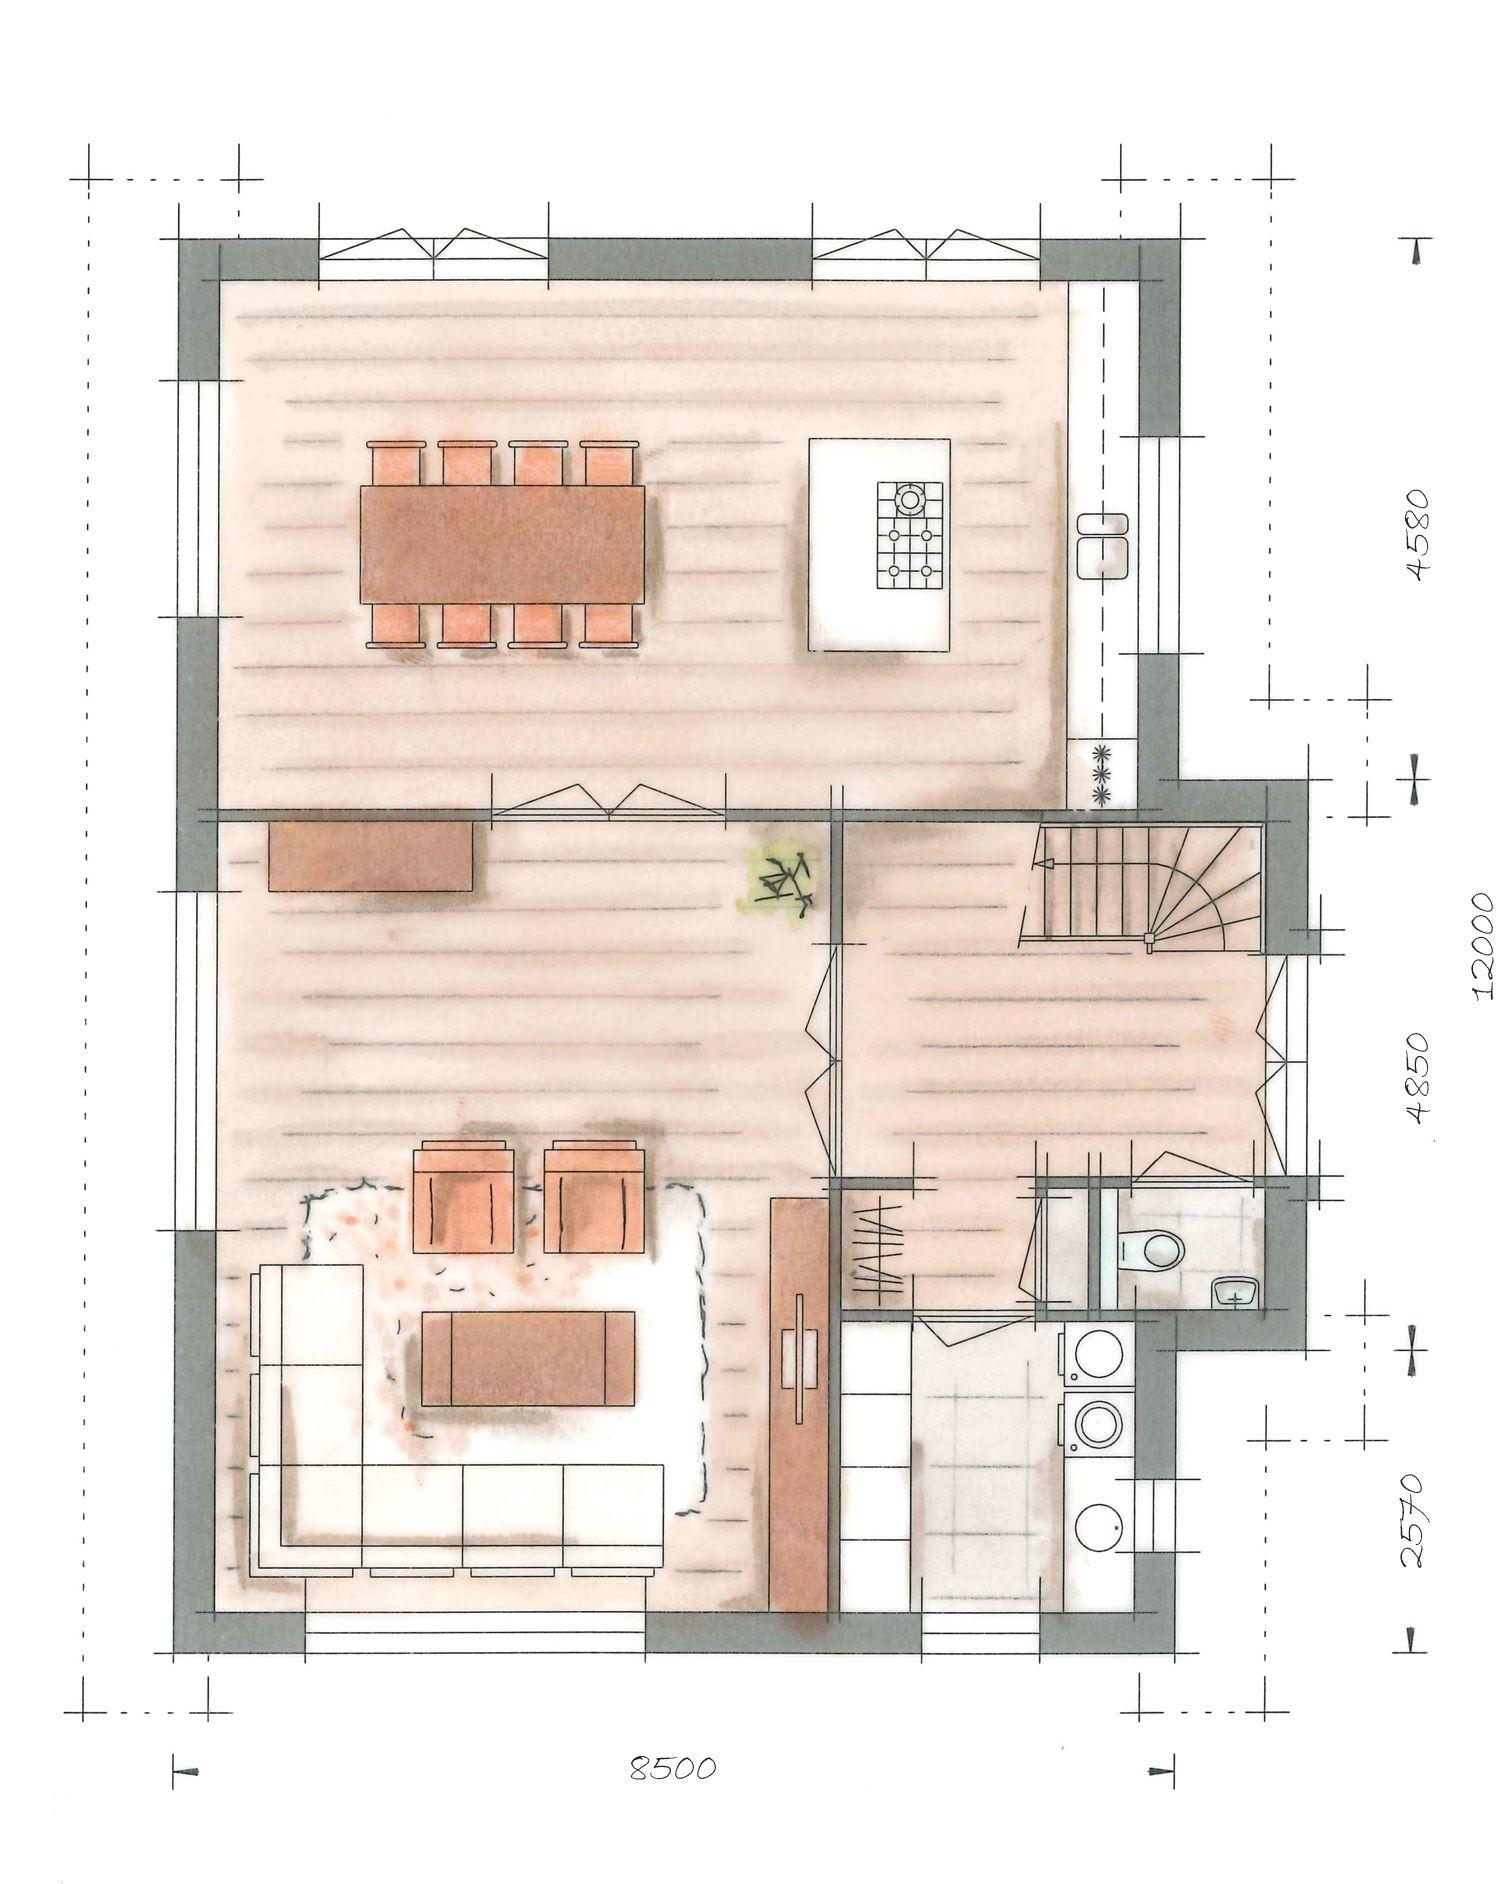 Villa groot koolwitje plattegrond begane grond nieuw for Plattegrond woning